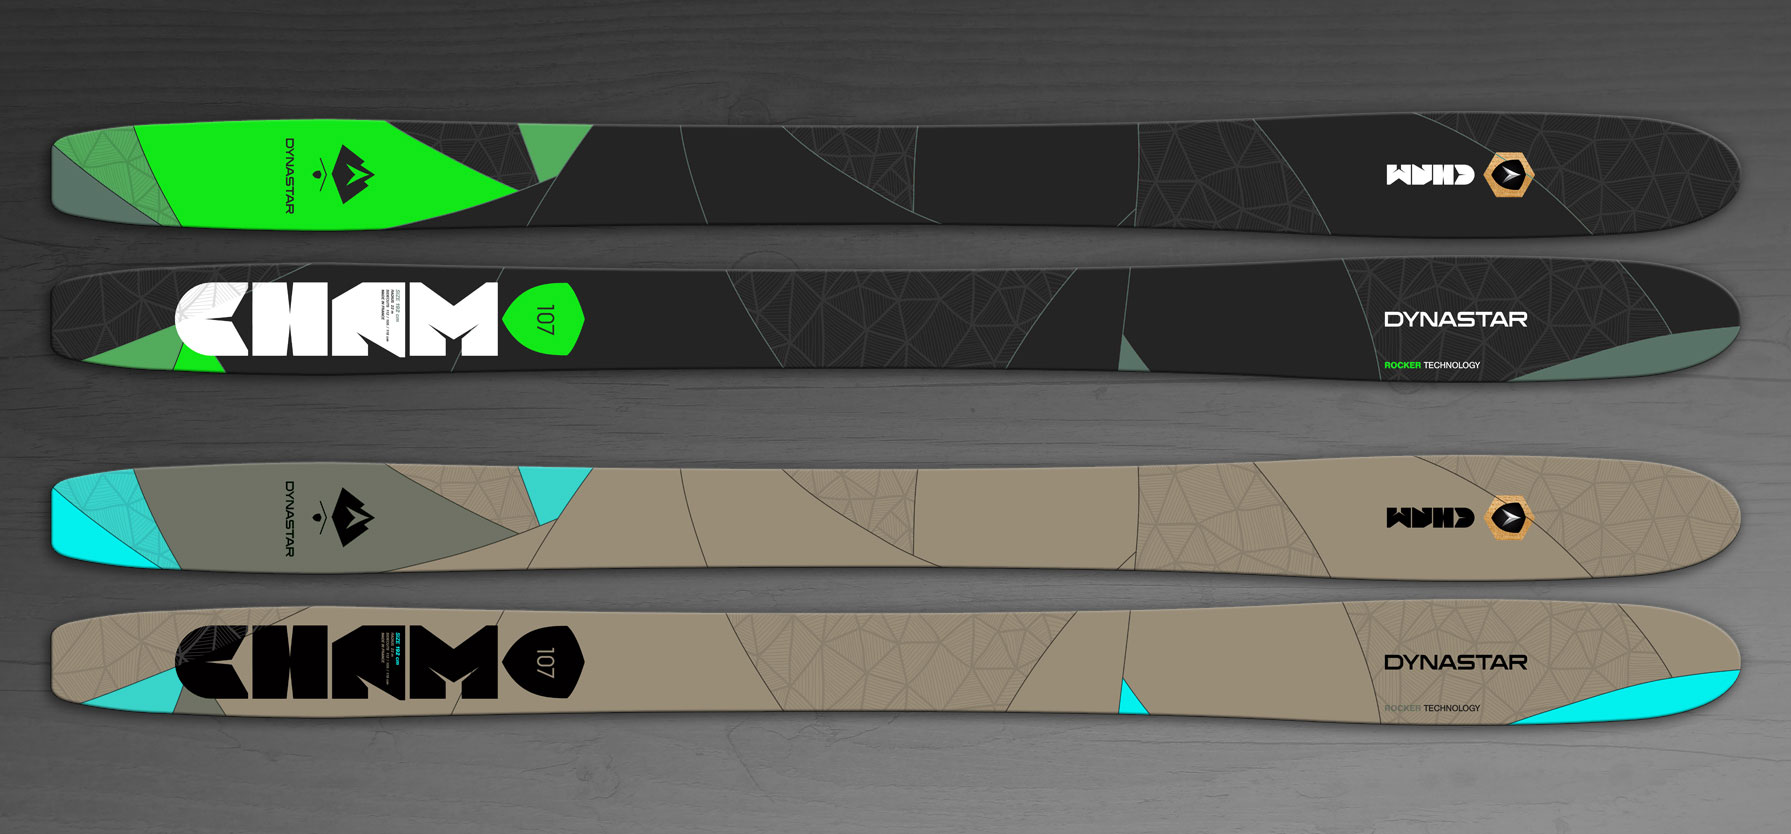 dynastar-skis-powertrack-06